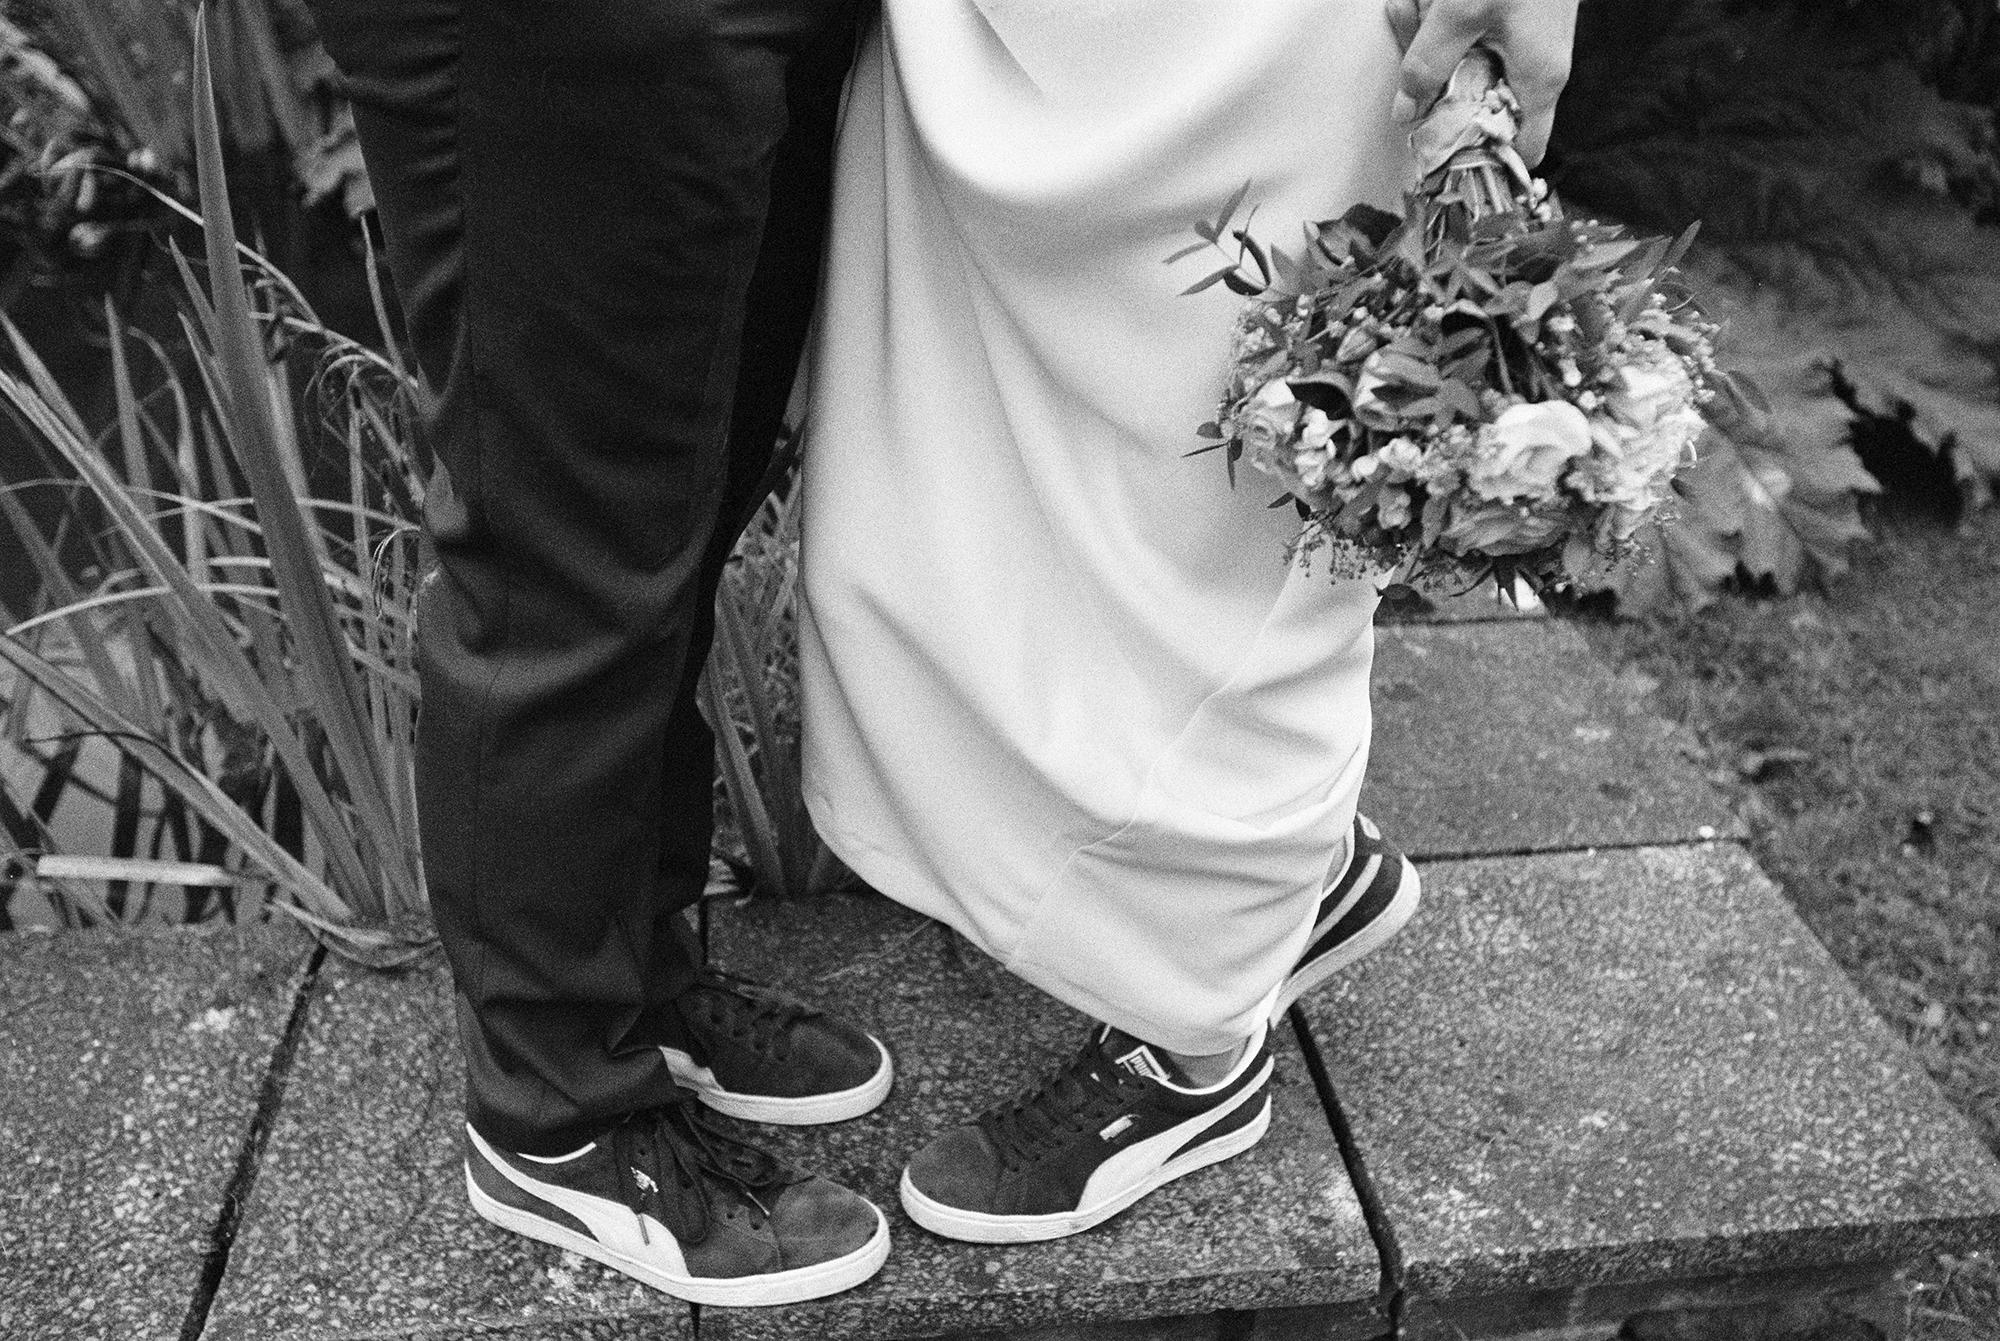 wedding_photographer_cumbria041.jpg